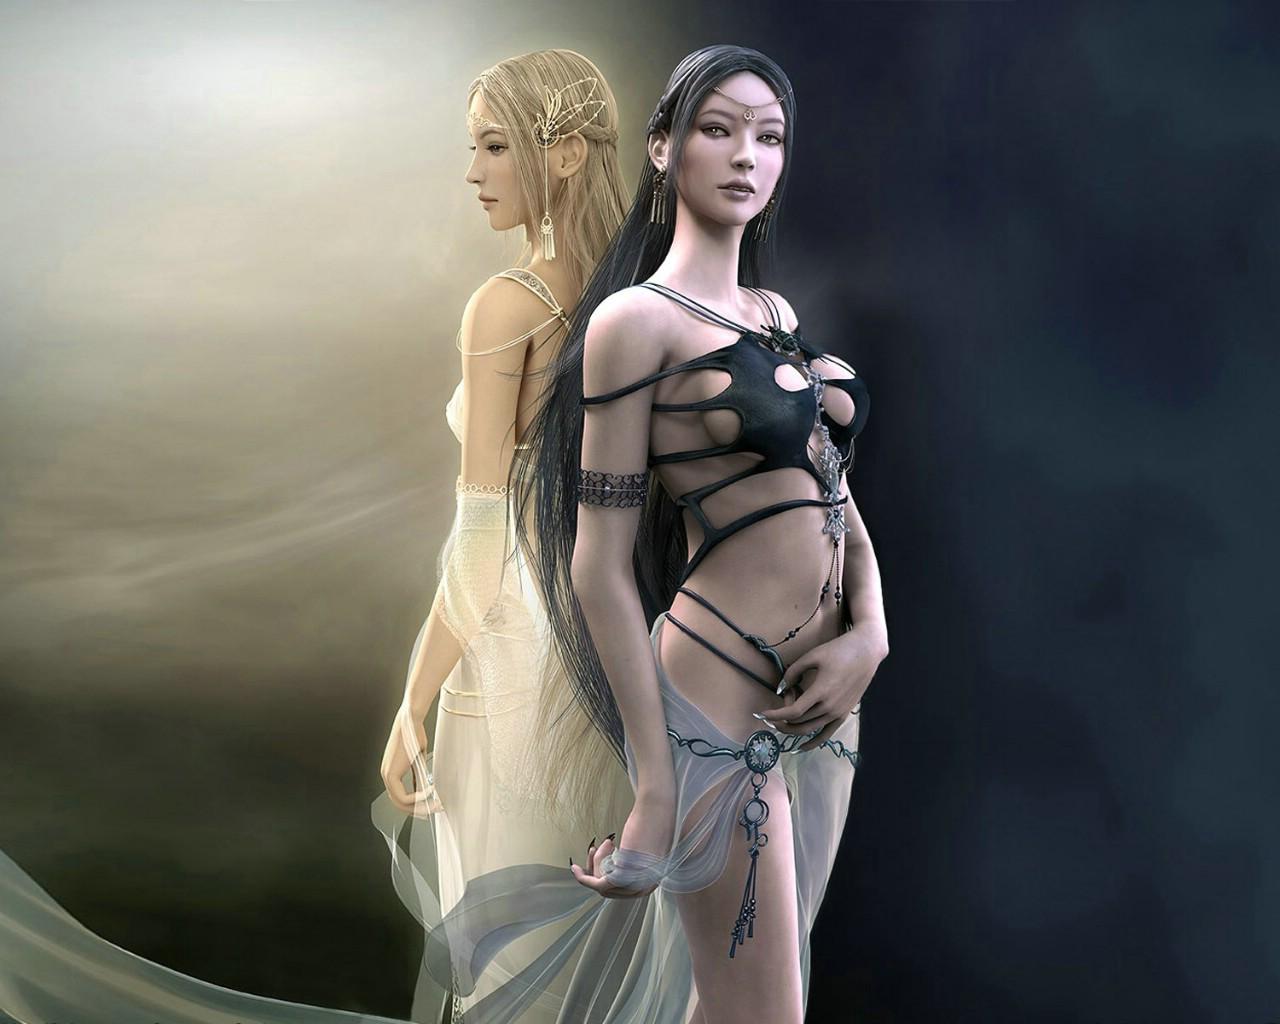 1024shaiya 游戏 性感美女cg壁纸壁纸,游戏盘点 美女角色cg高清图片